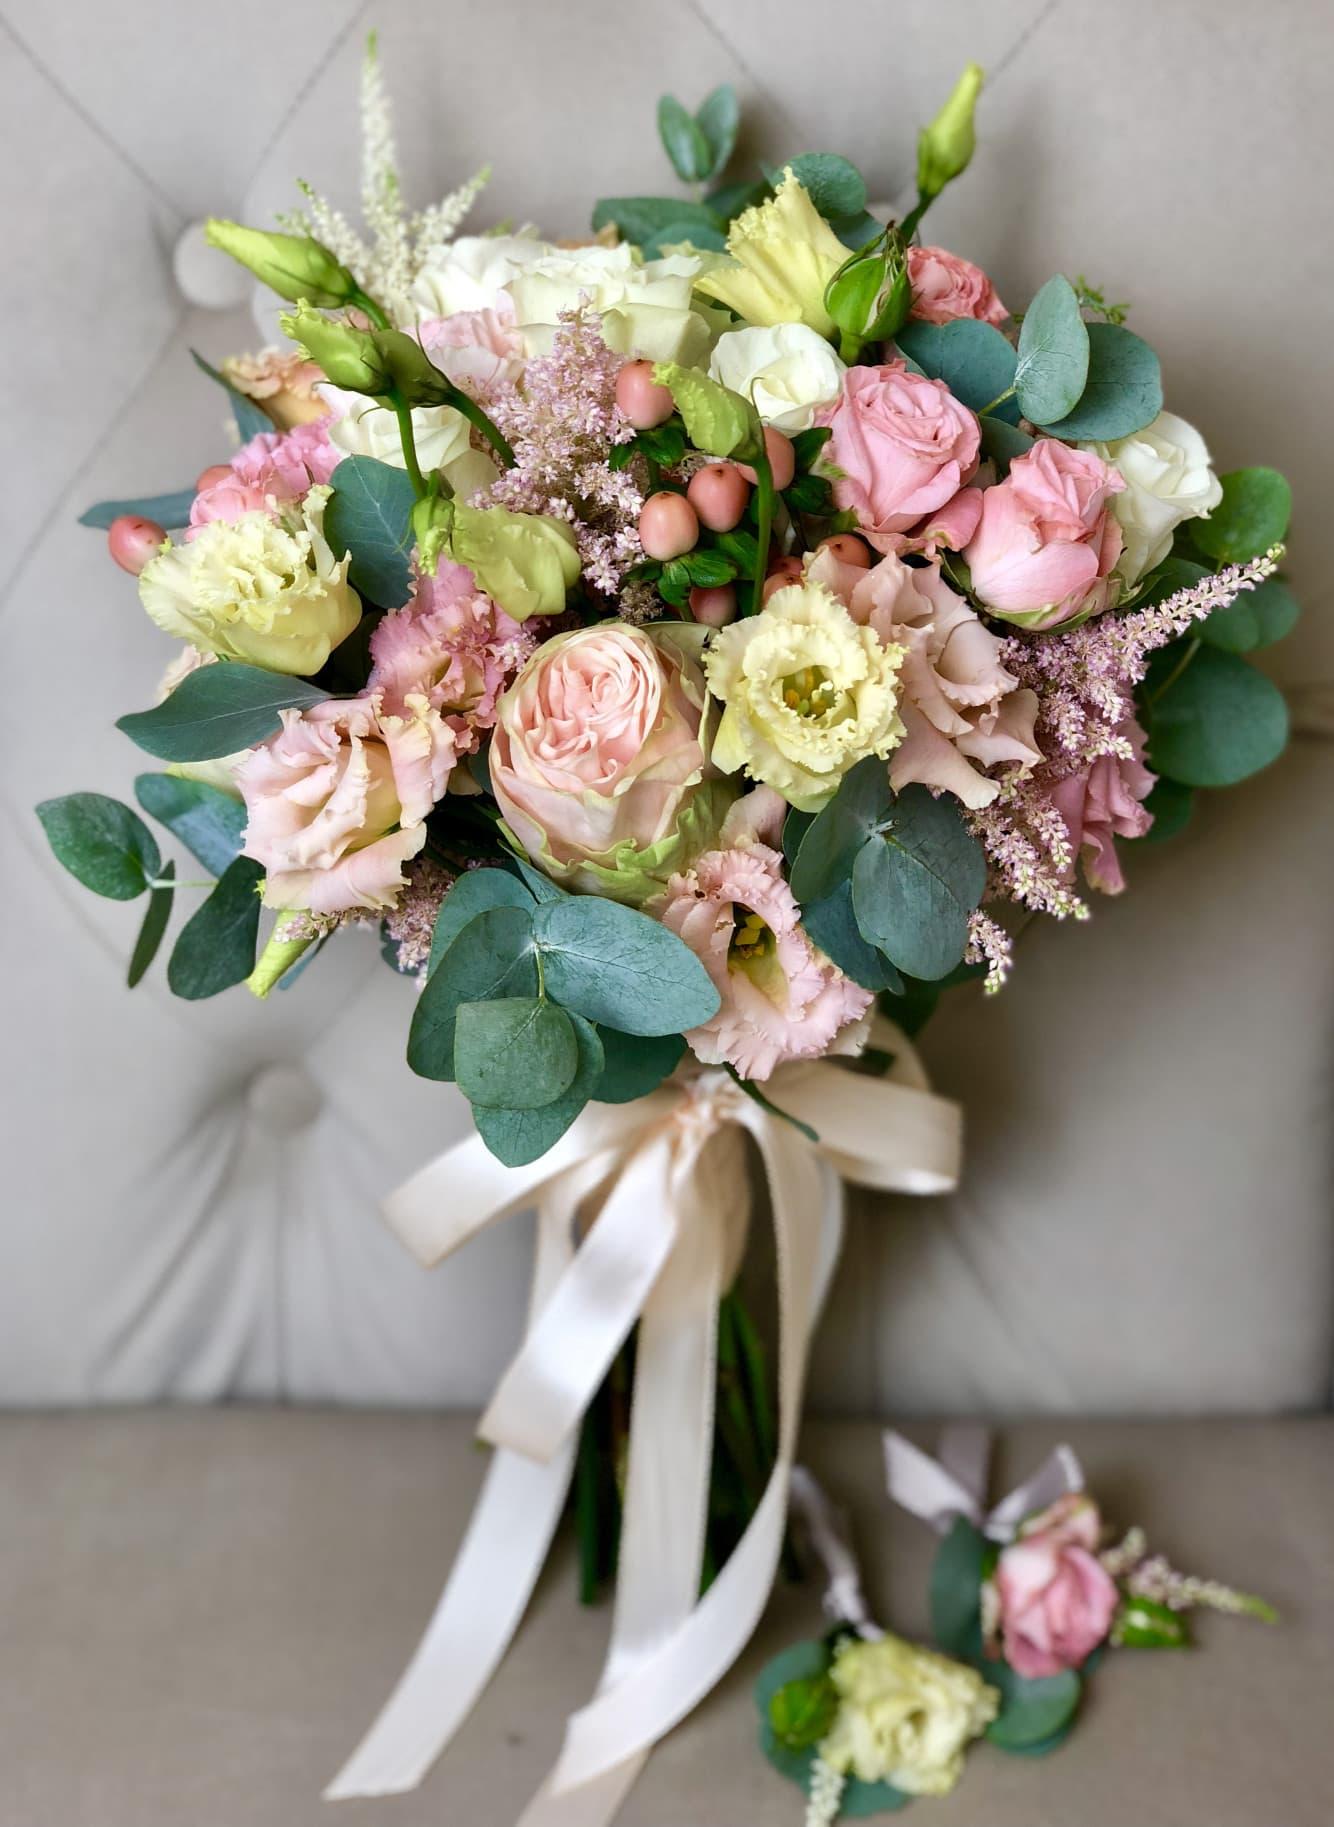 Букет невесты 13 – Інтернет-магазин квітів STUDIO Flores